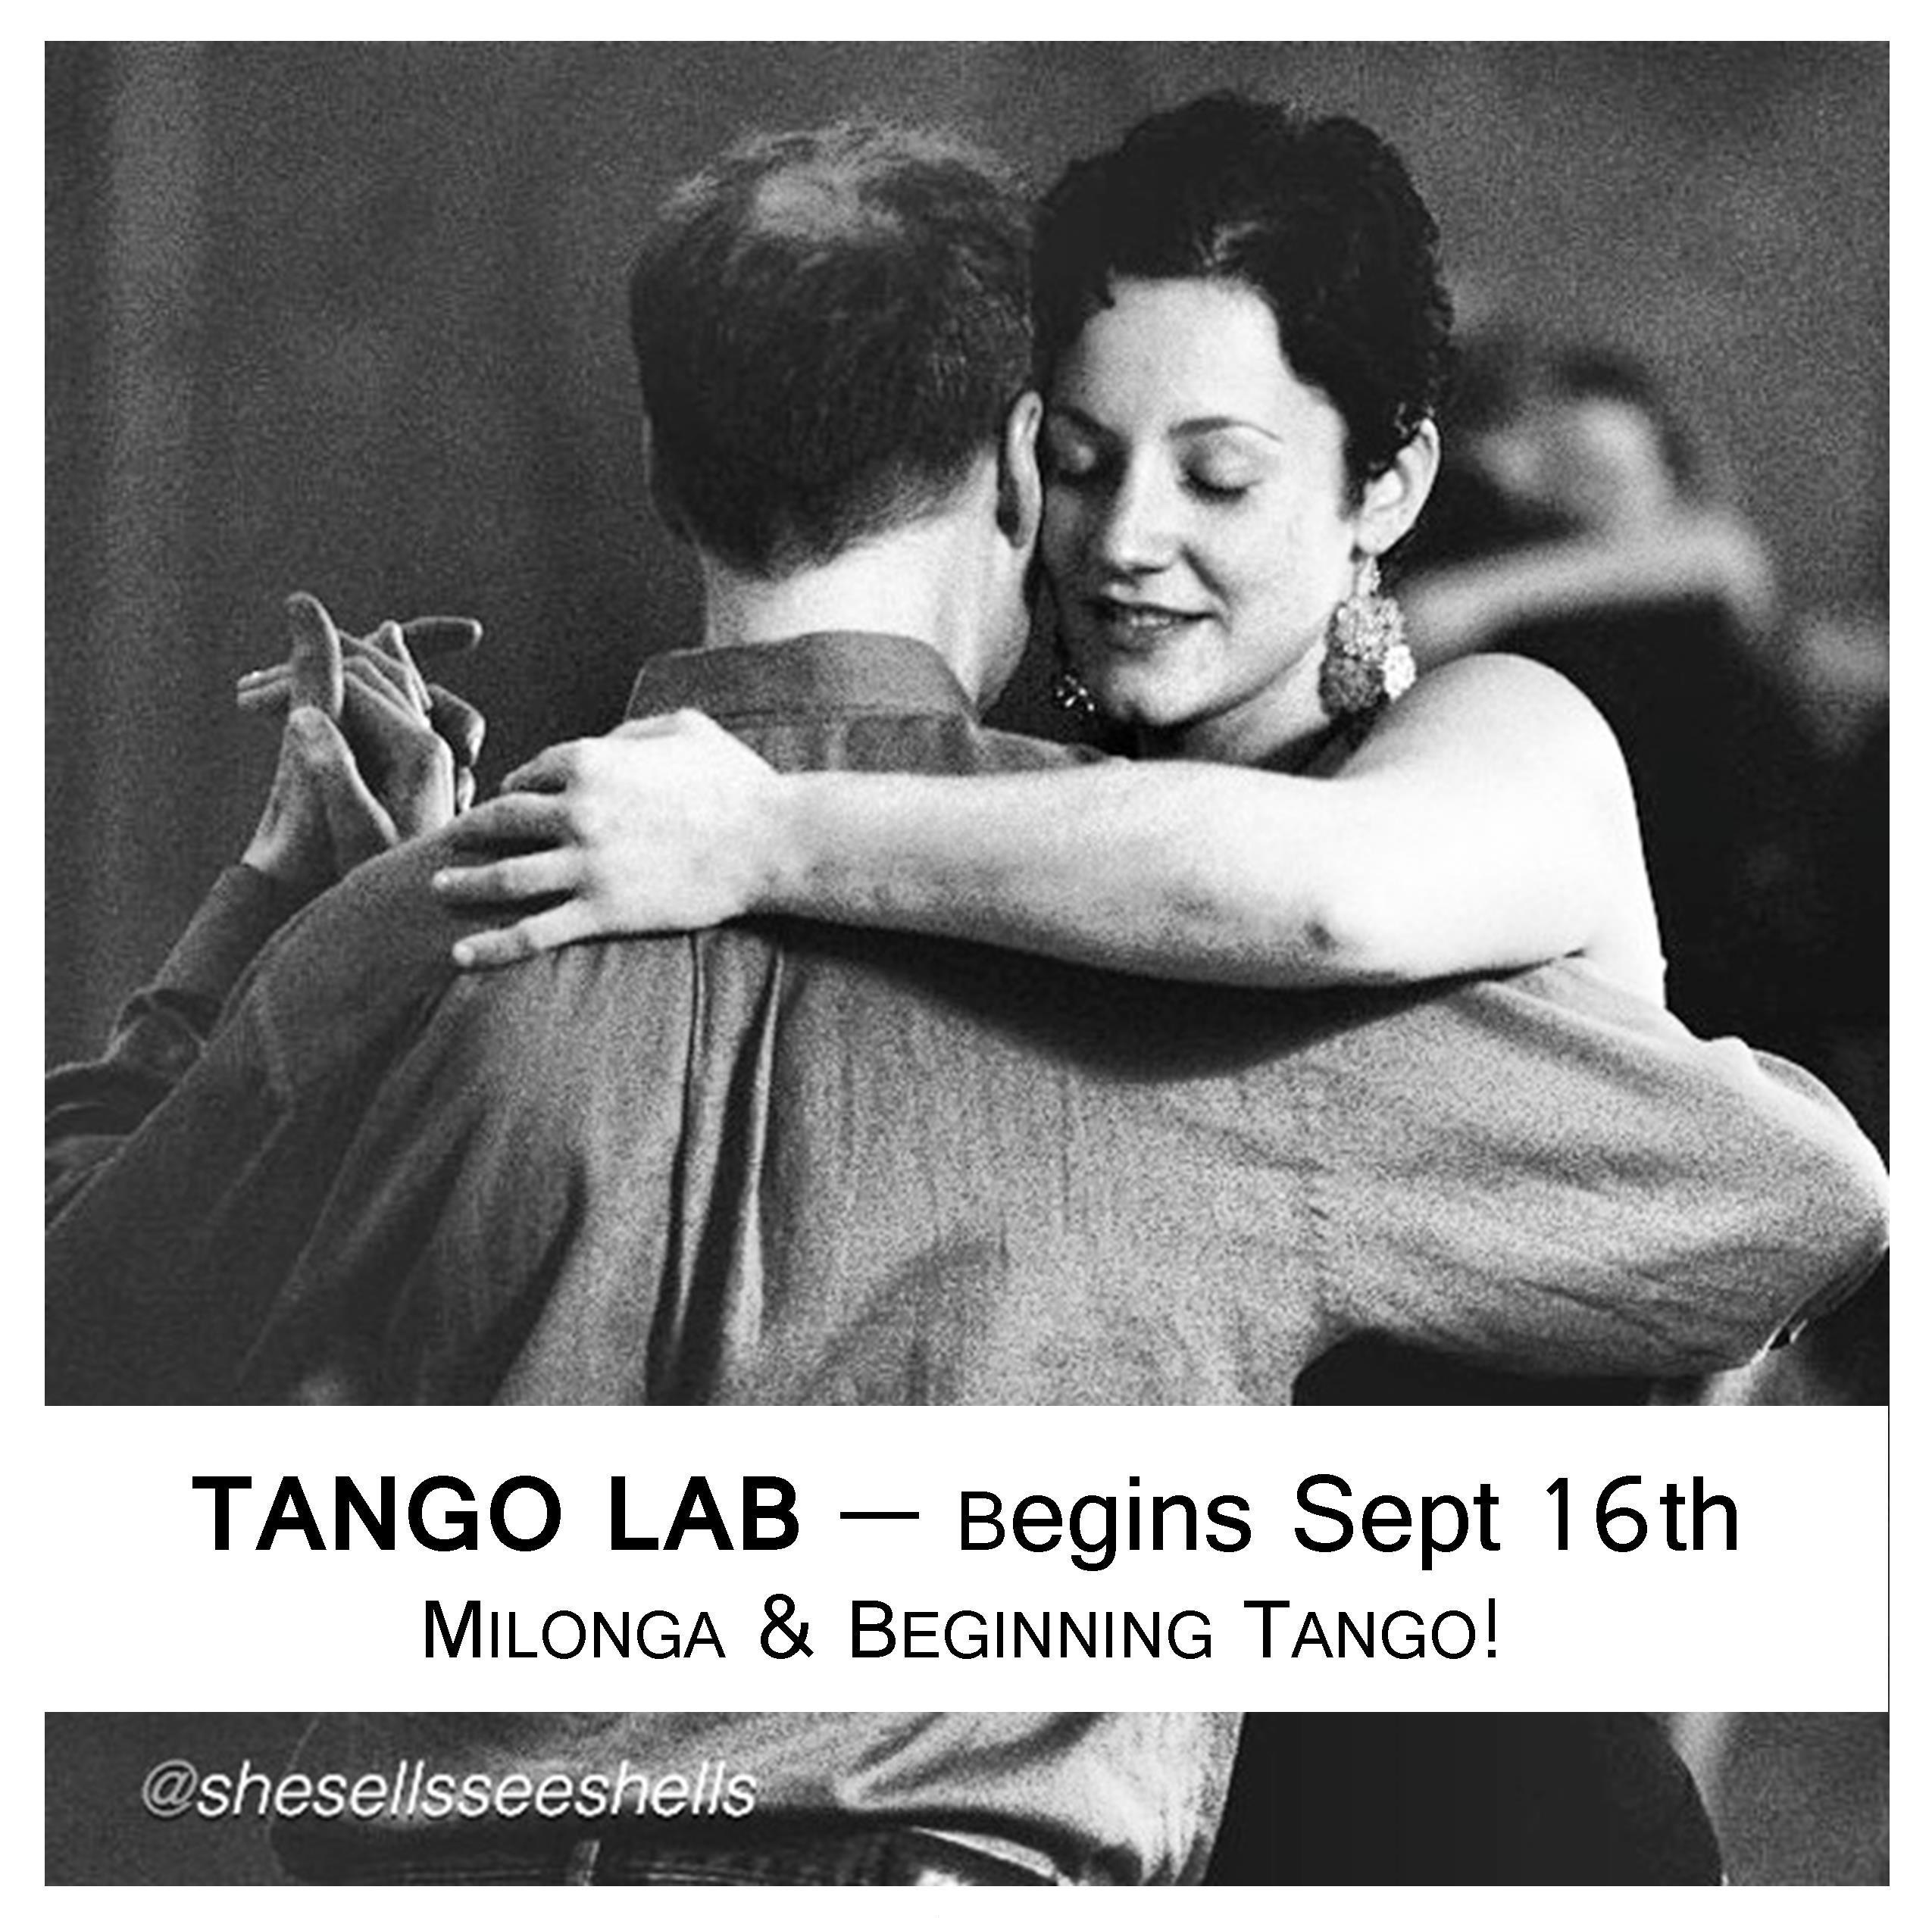 TANGO LAB by Gabriela Condrea